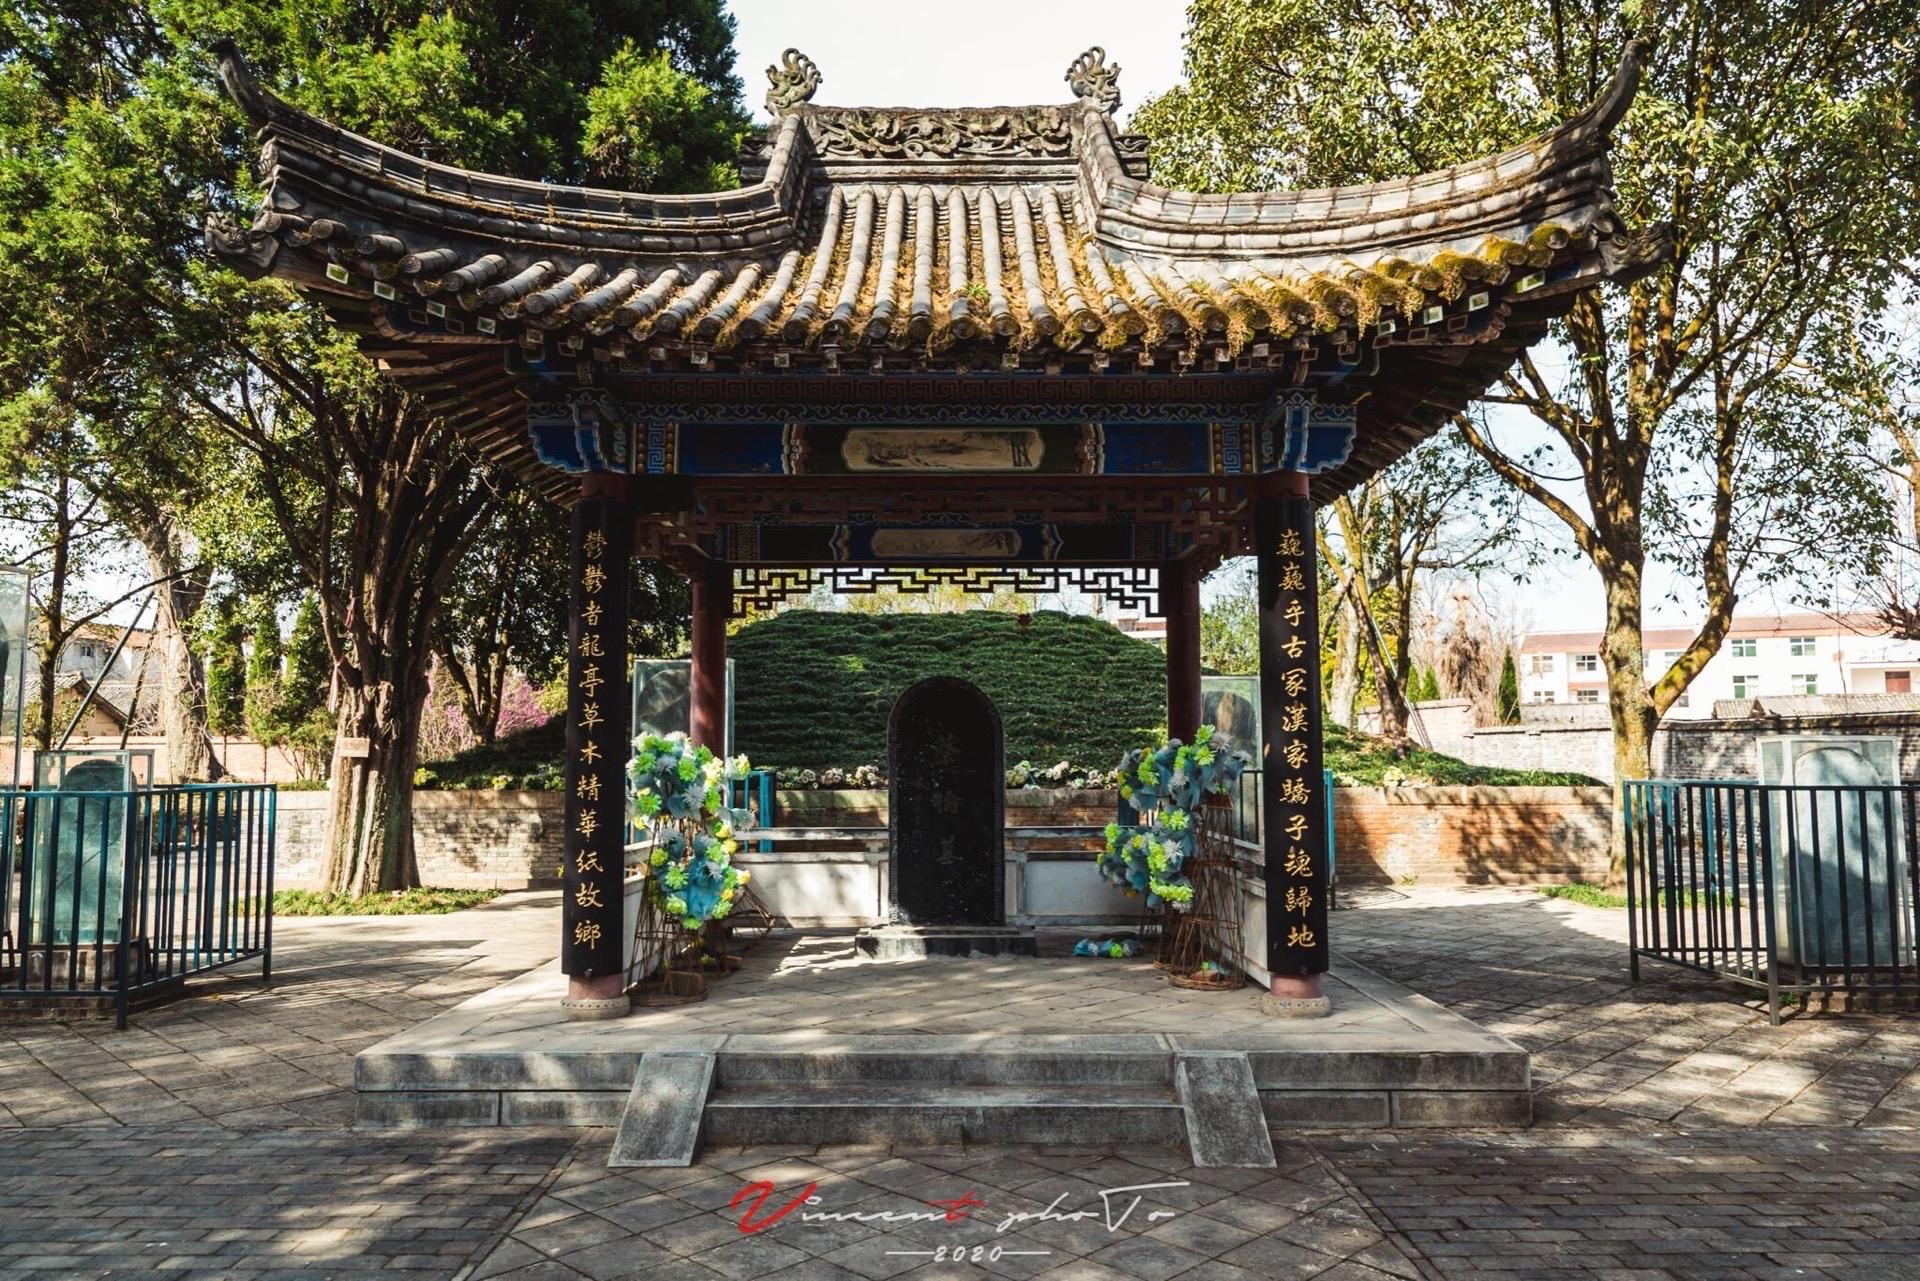 Cai Lun's Tomb